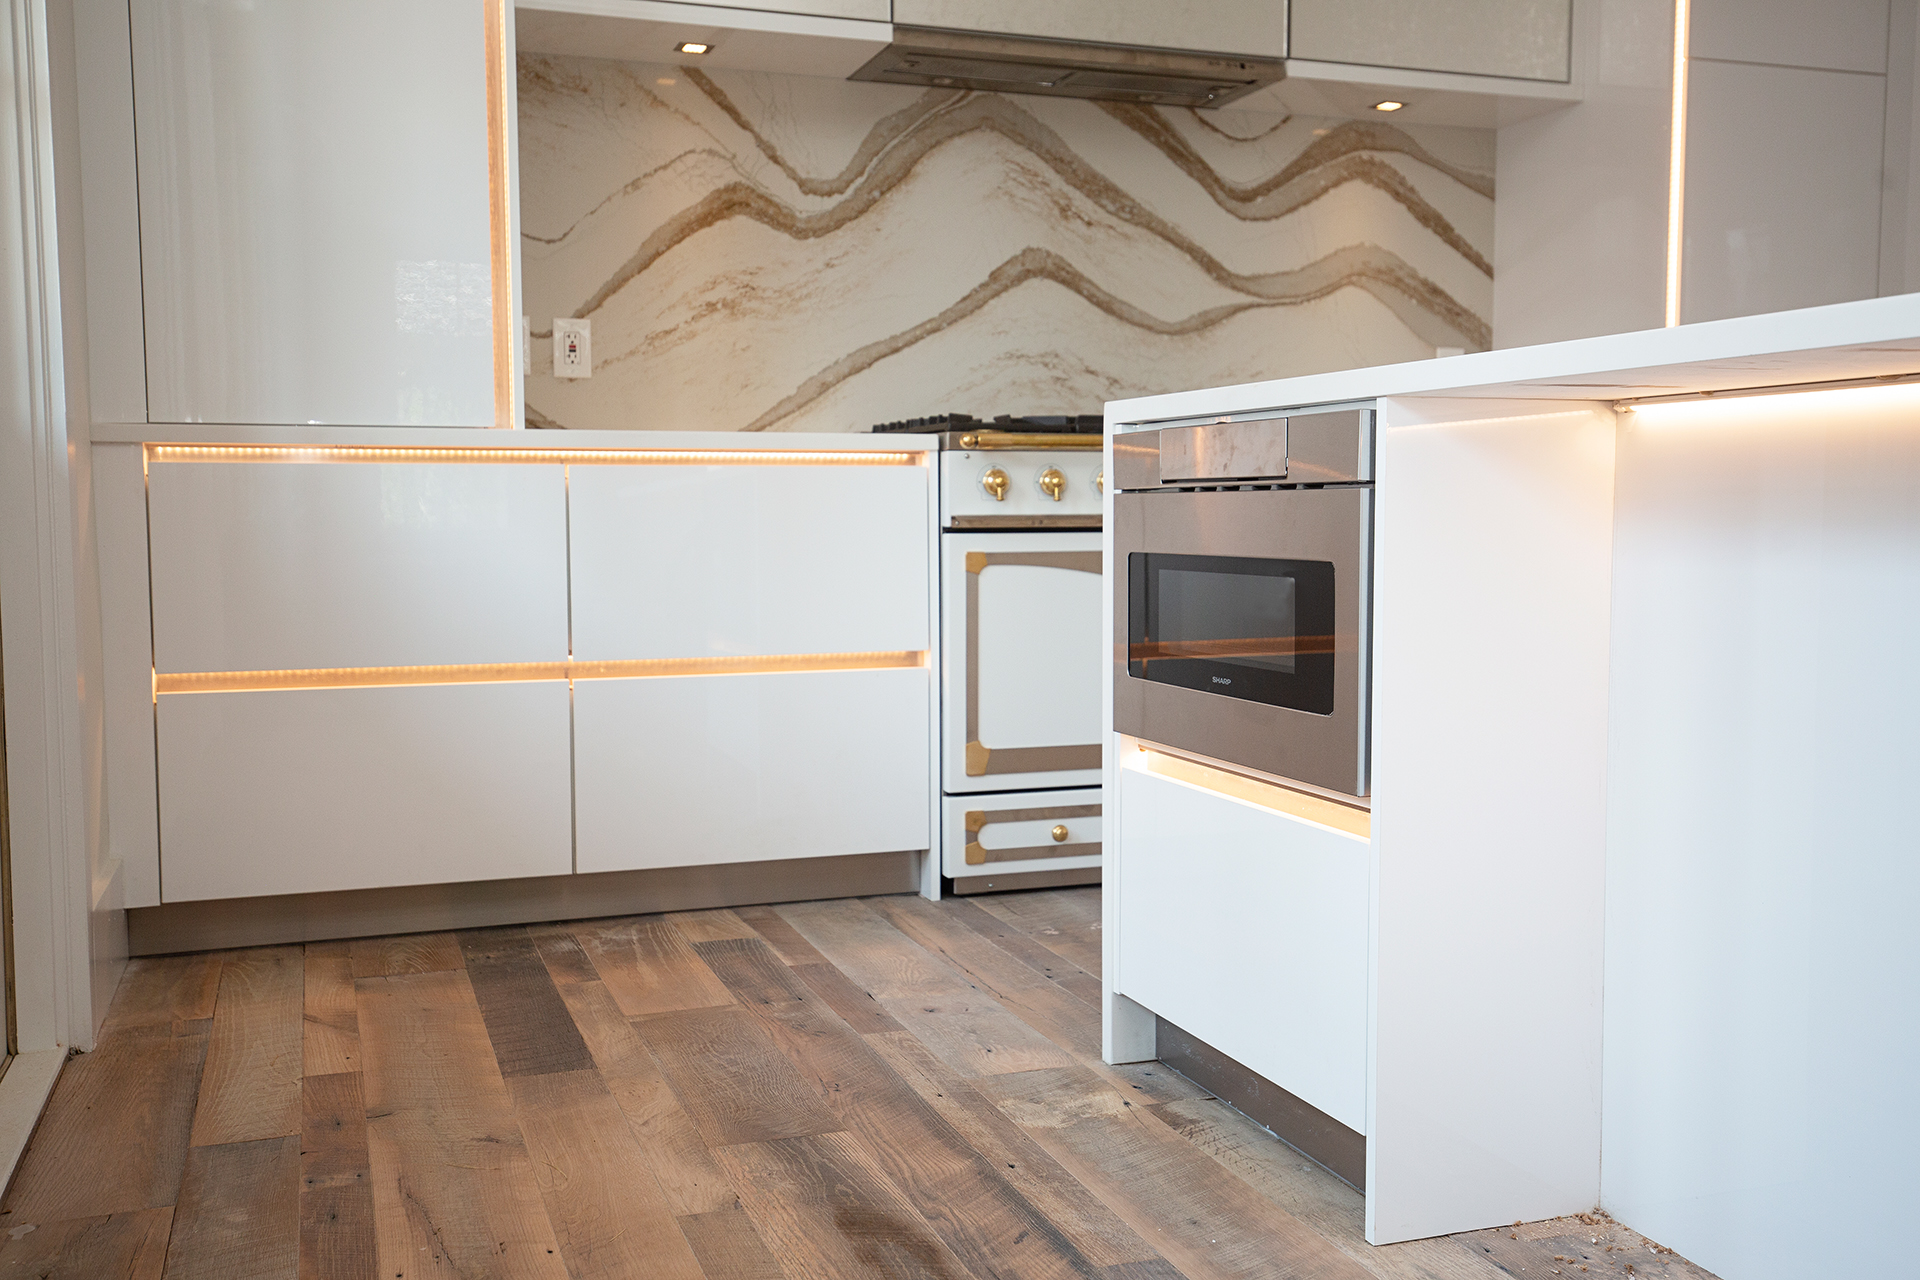 marquis-fine-cabinetry-remodel-milano-kitchen